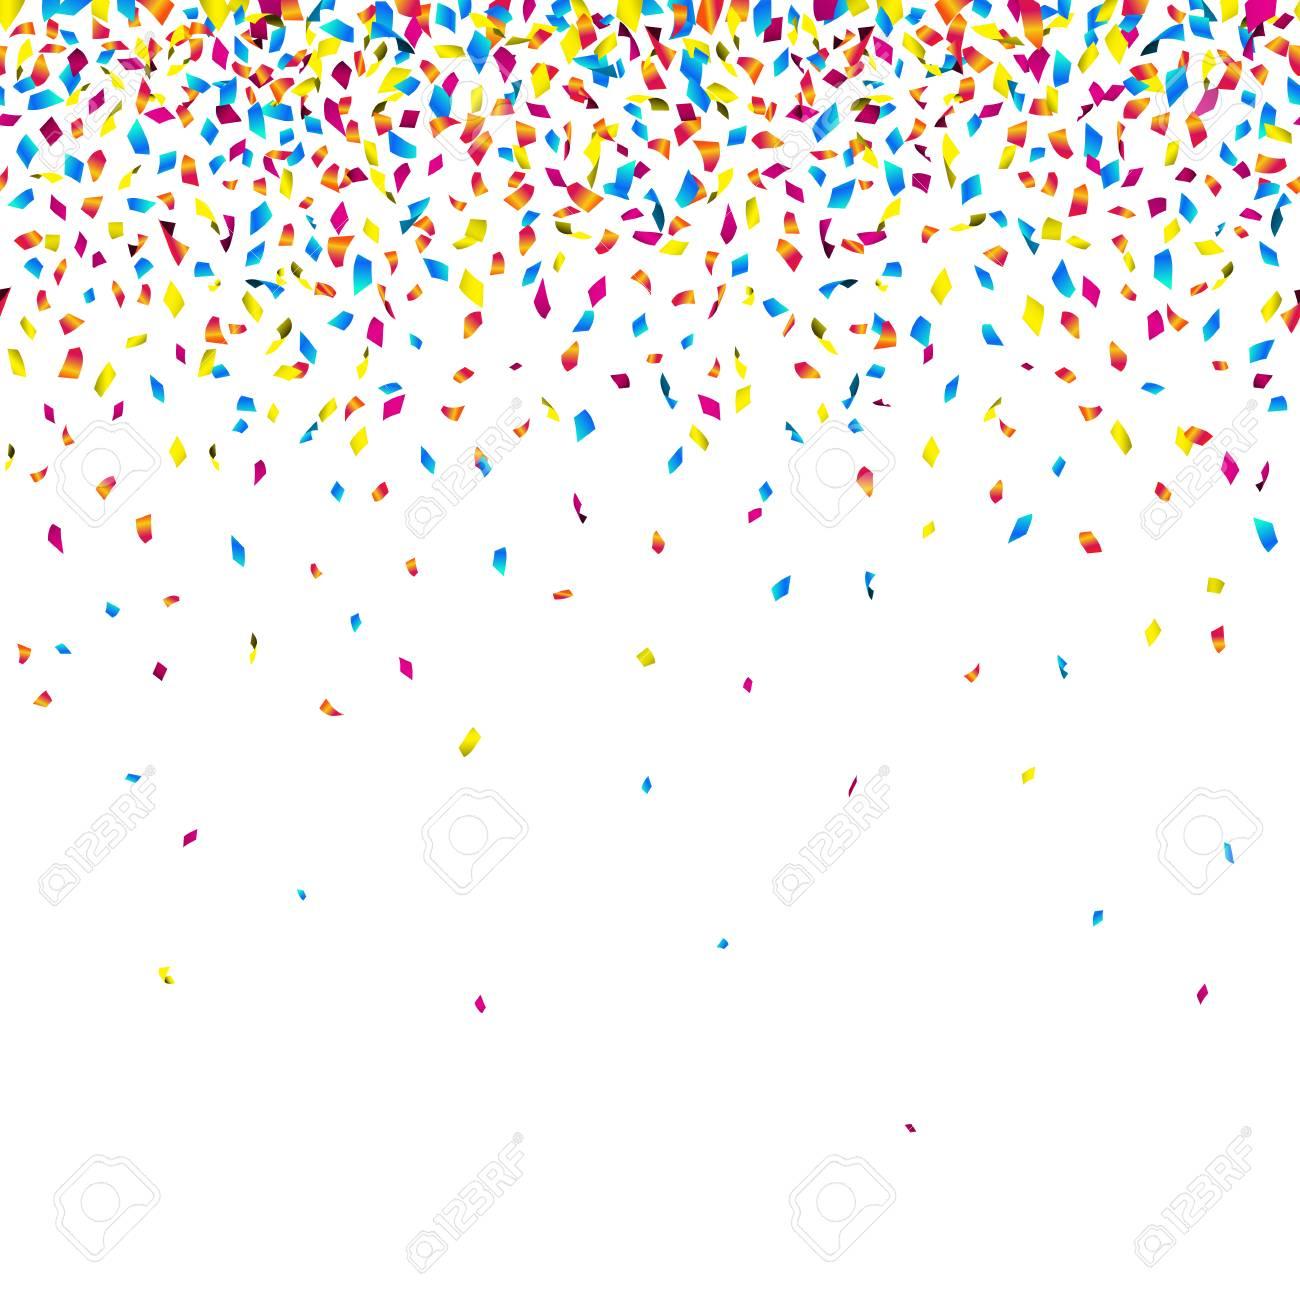 Colorful falling confetti on white background  Seamless celebration